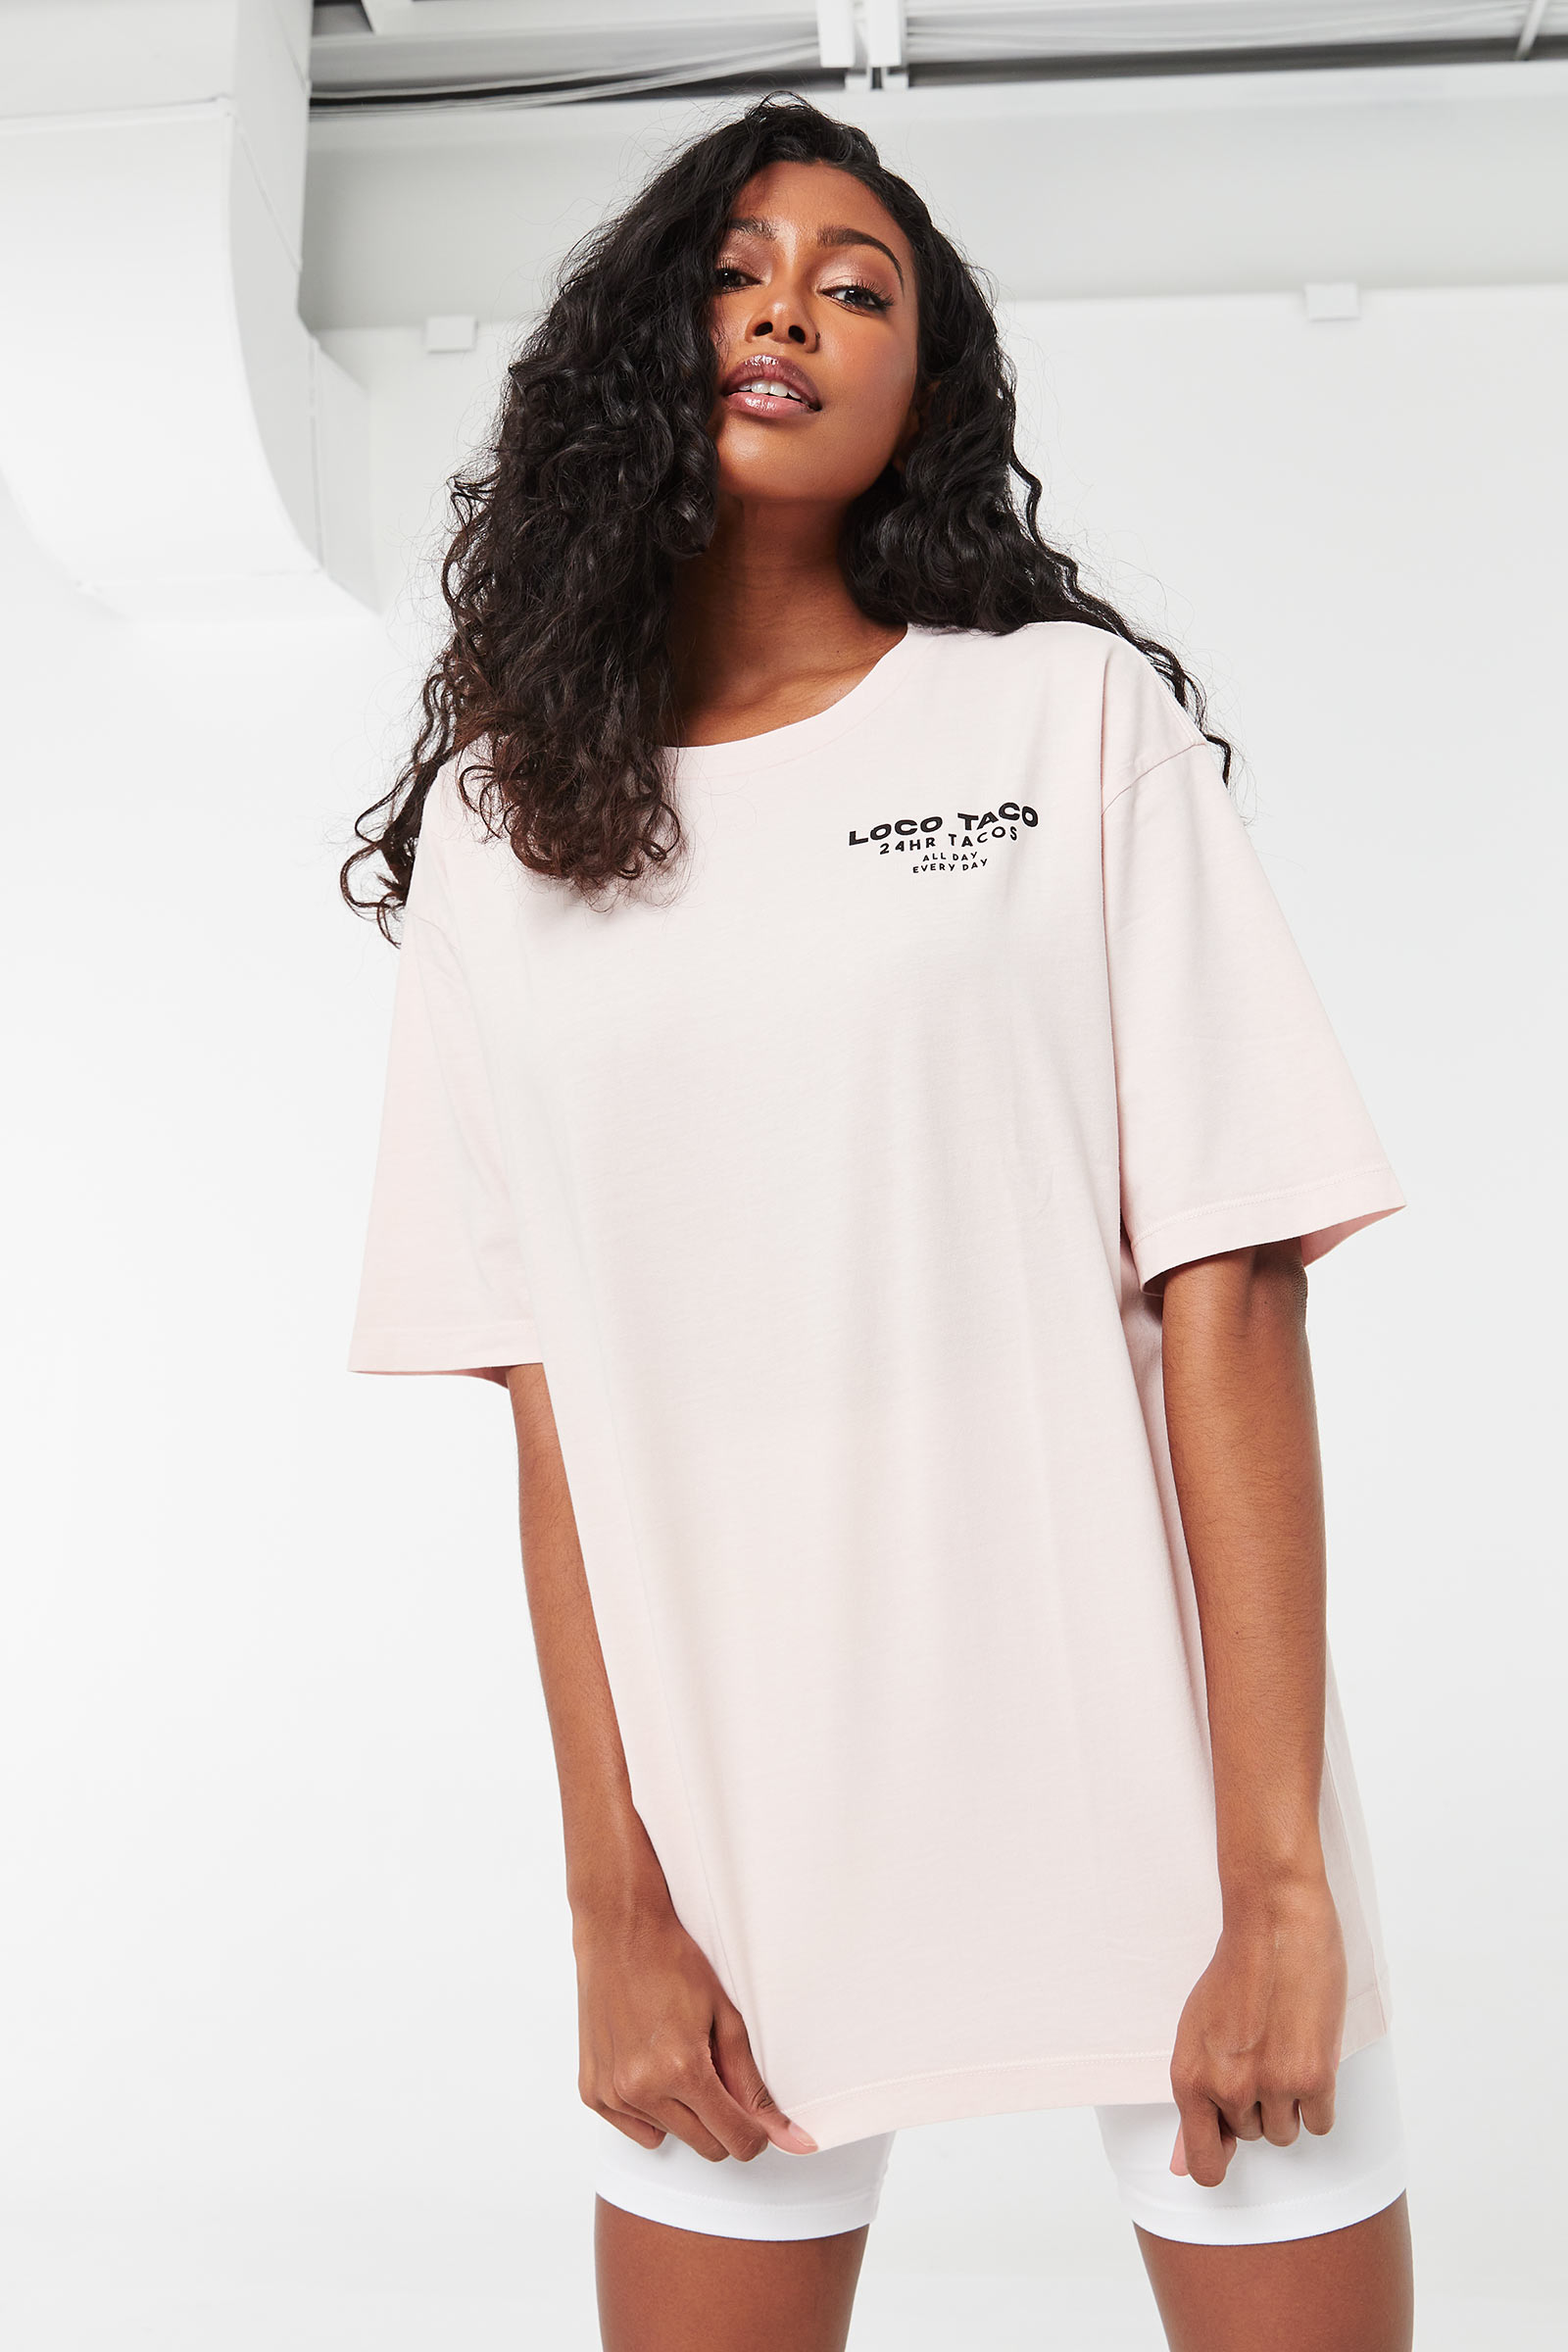 T-shirt boyfriend Loco Taco